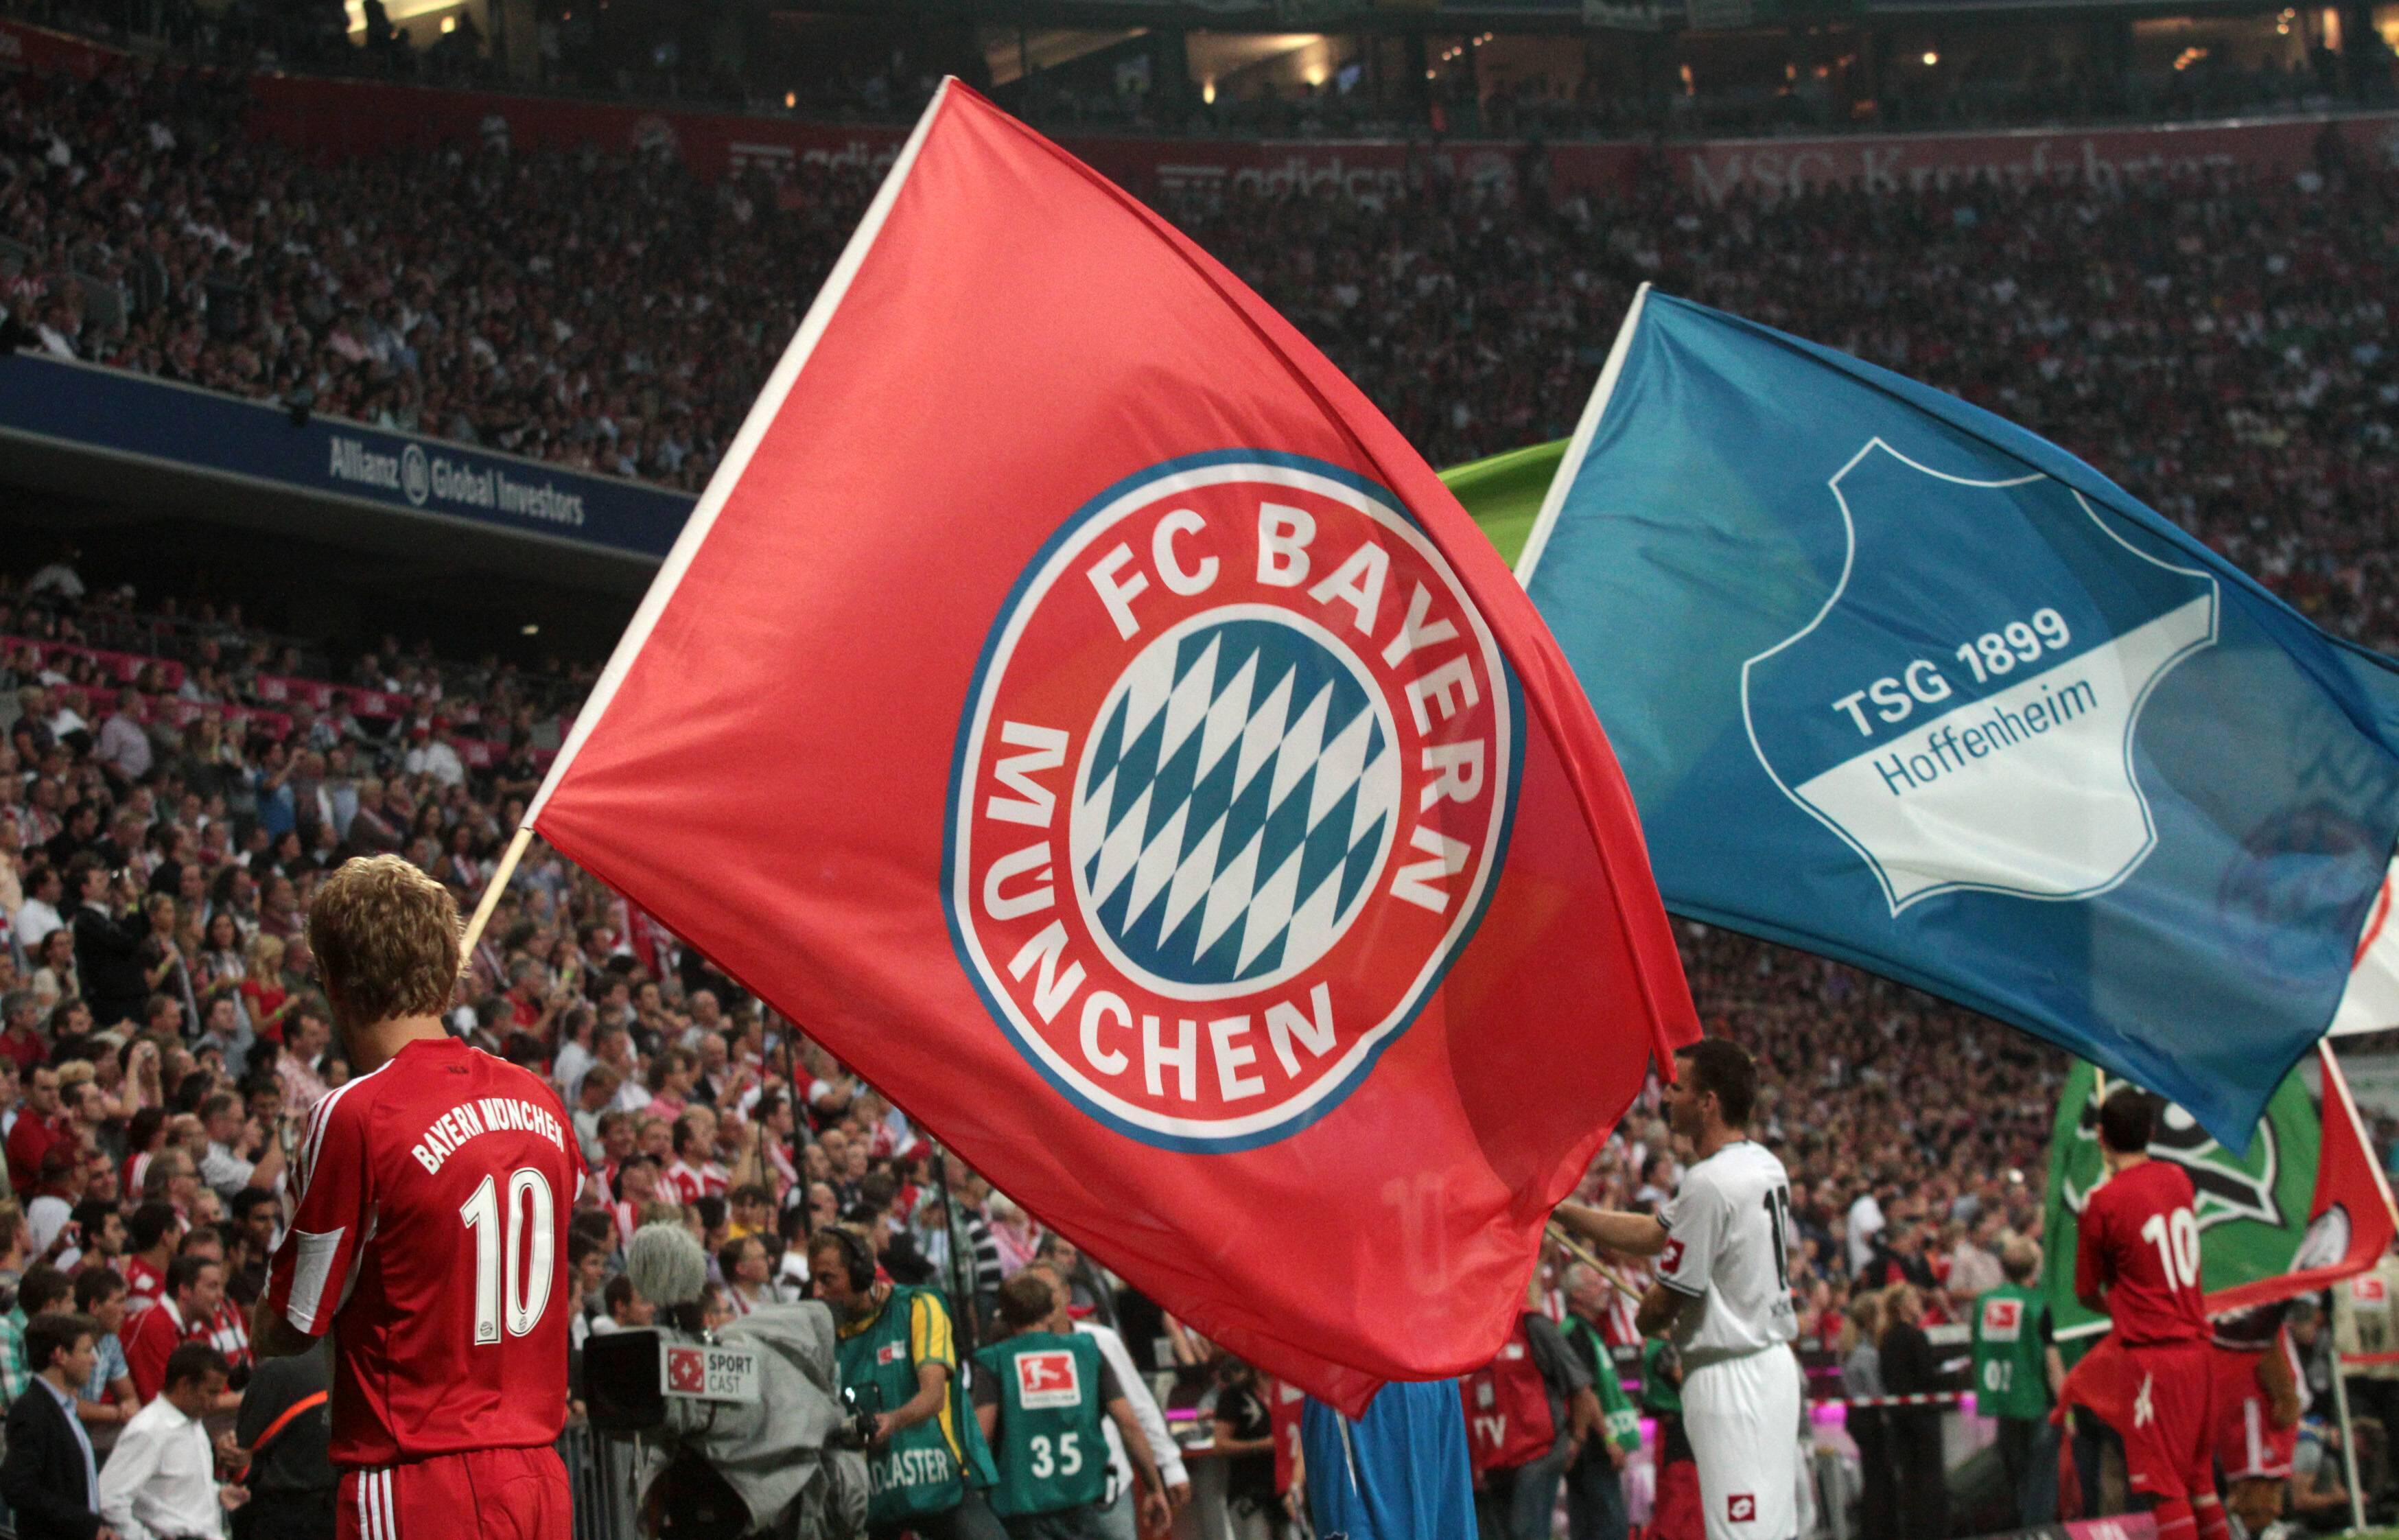 Bild zu FC Bayern, 1899 Hoffenheim, Bundesliga, Nachwuchs